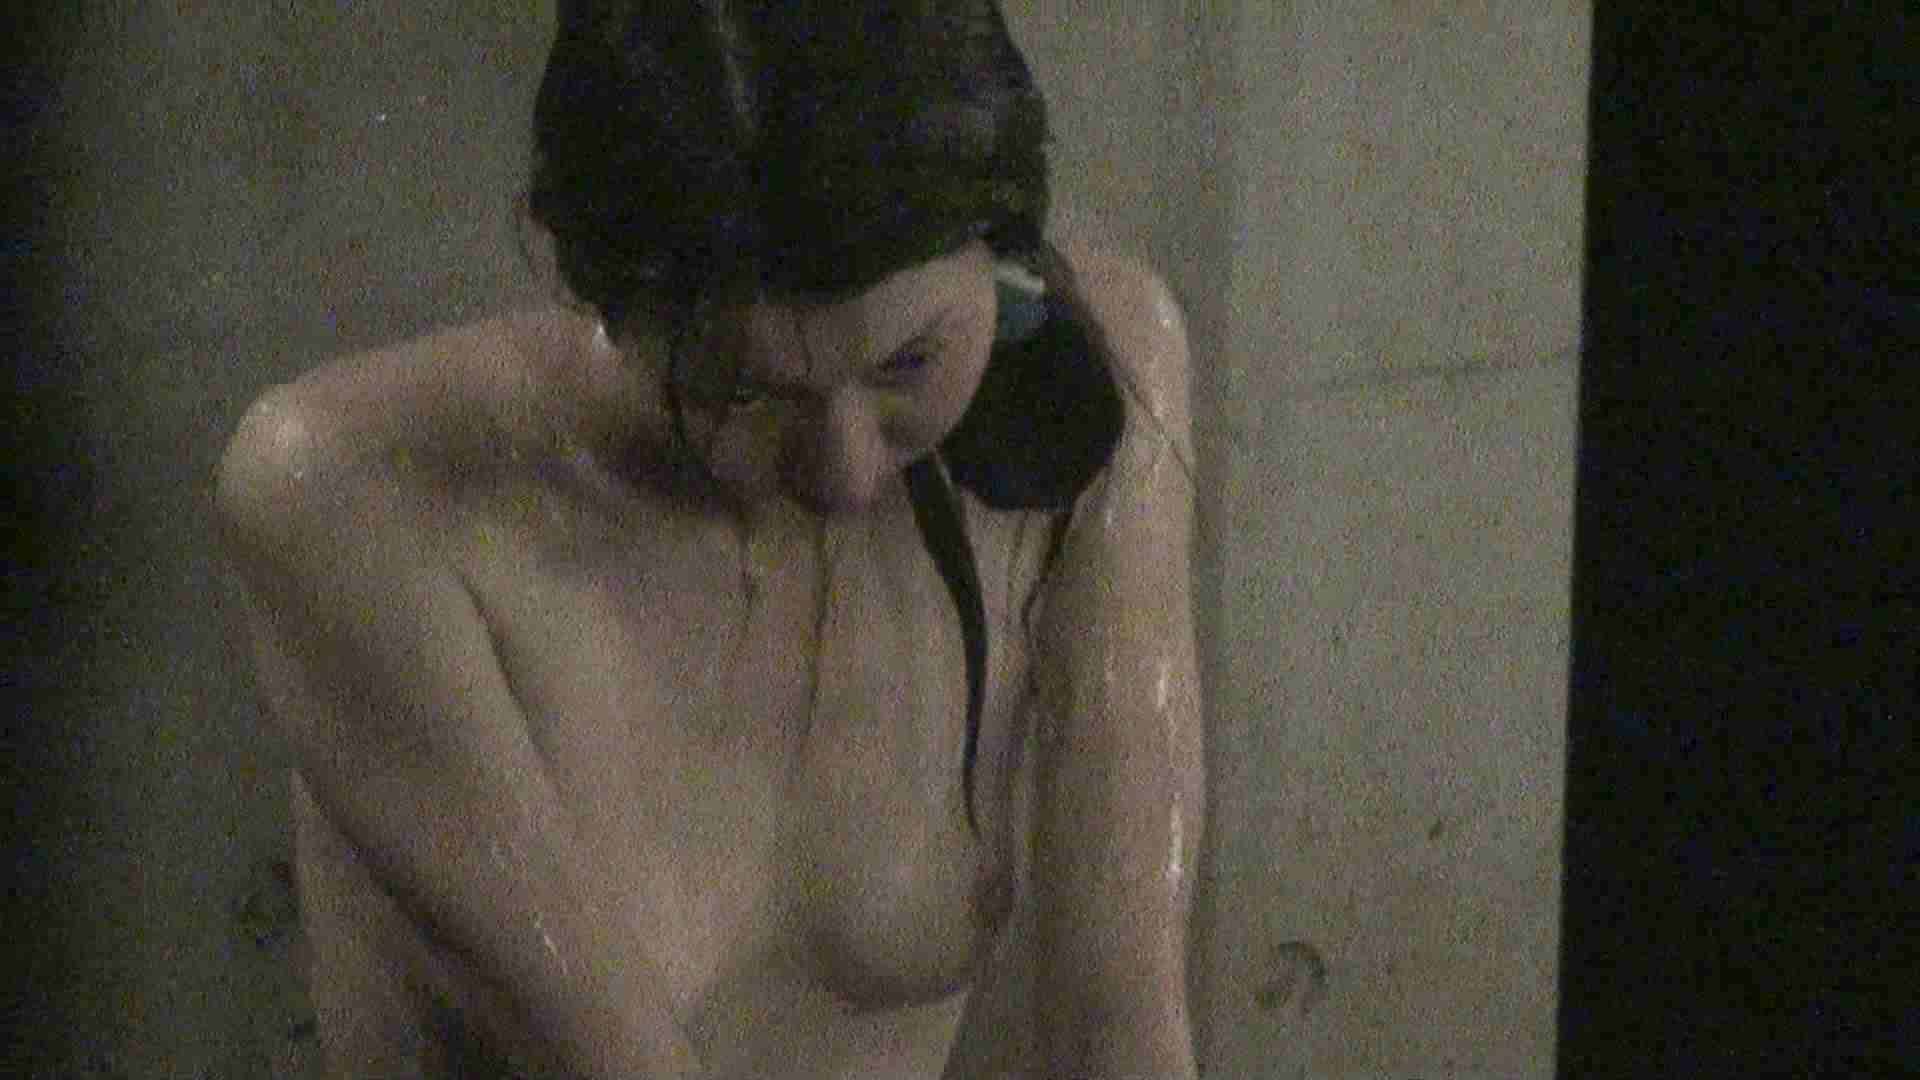 Aquaな露天風呂Vol.314 露天風呂編 | 盗撮シリーズ  107PIX 45